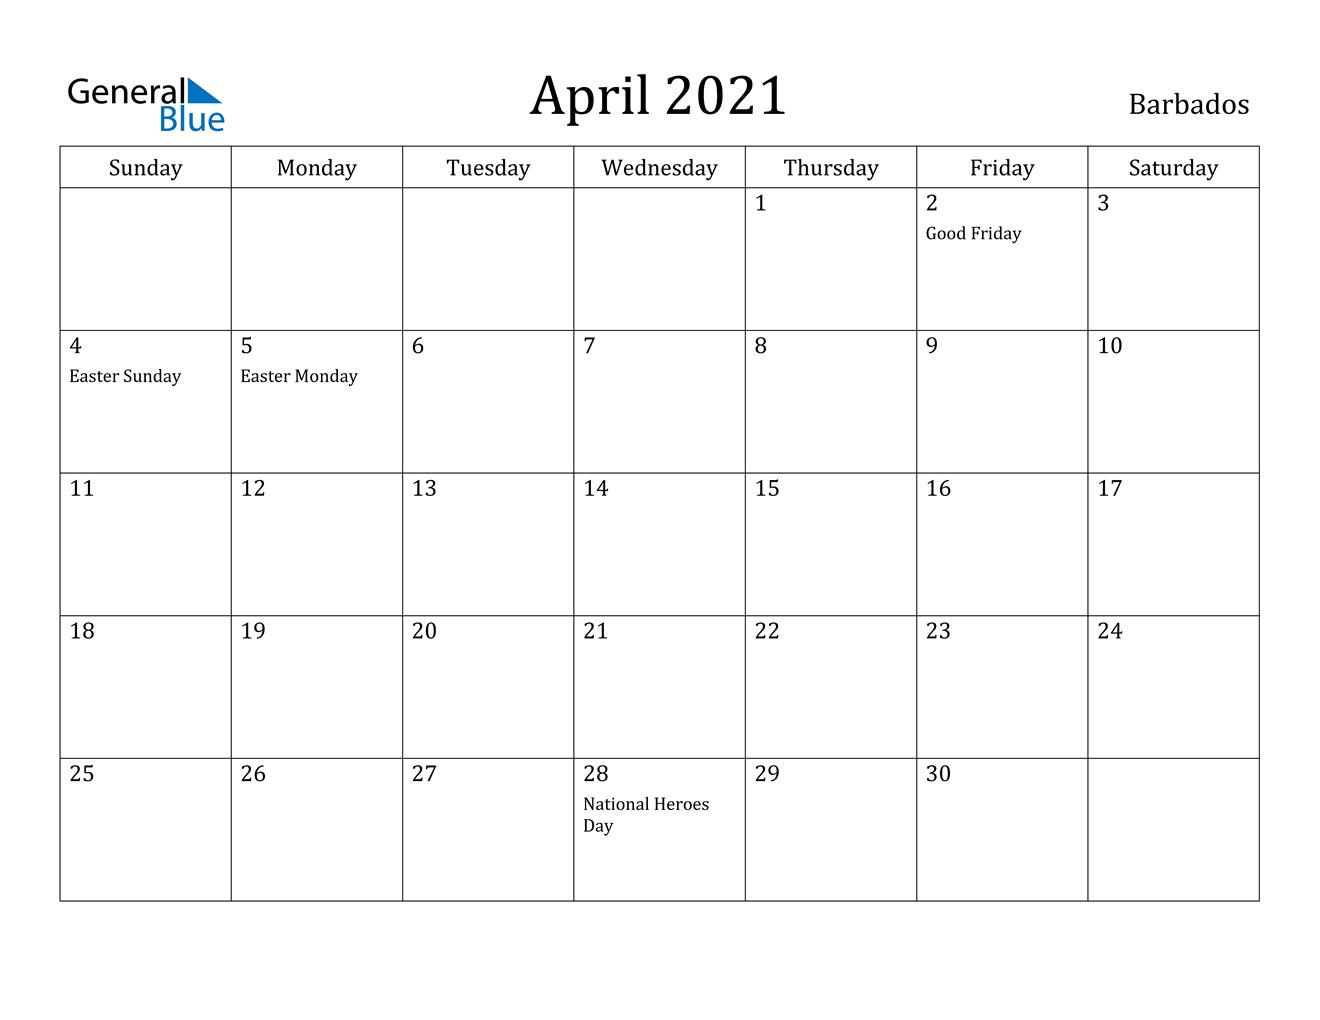 April 2021 Calendar - Barbados